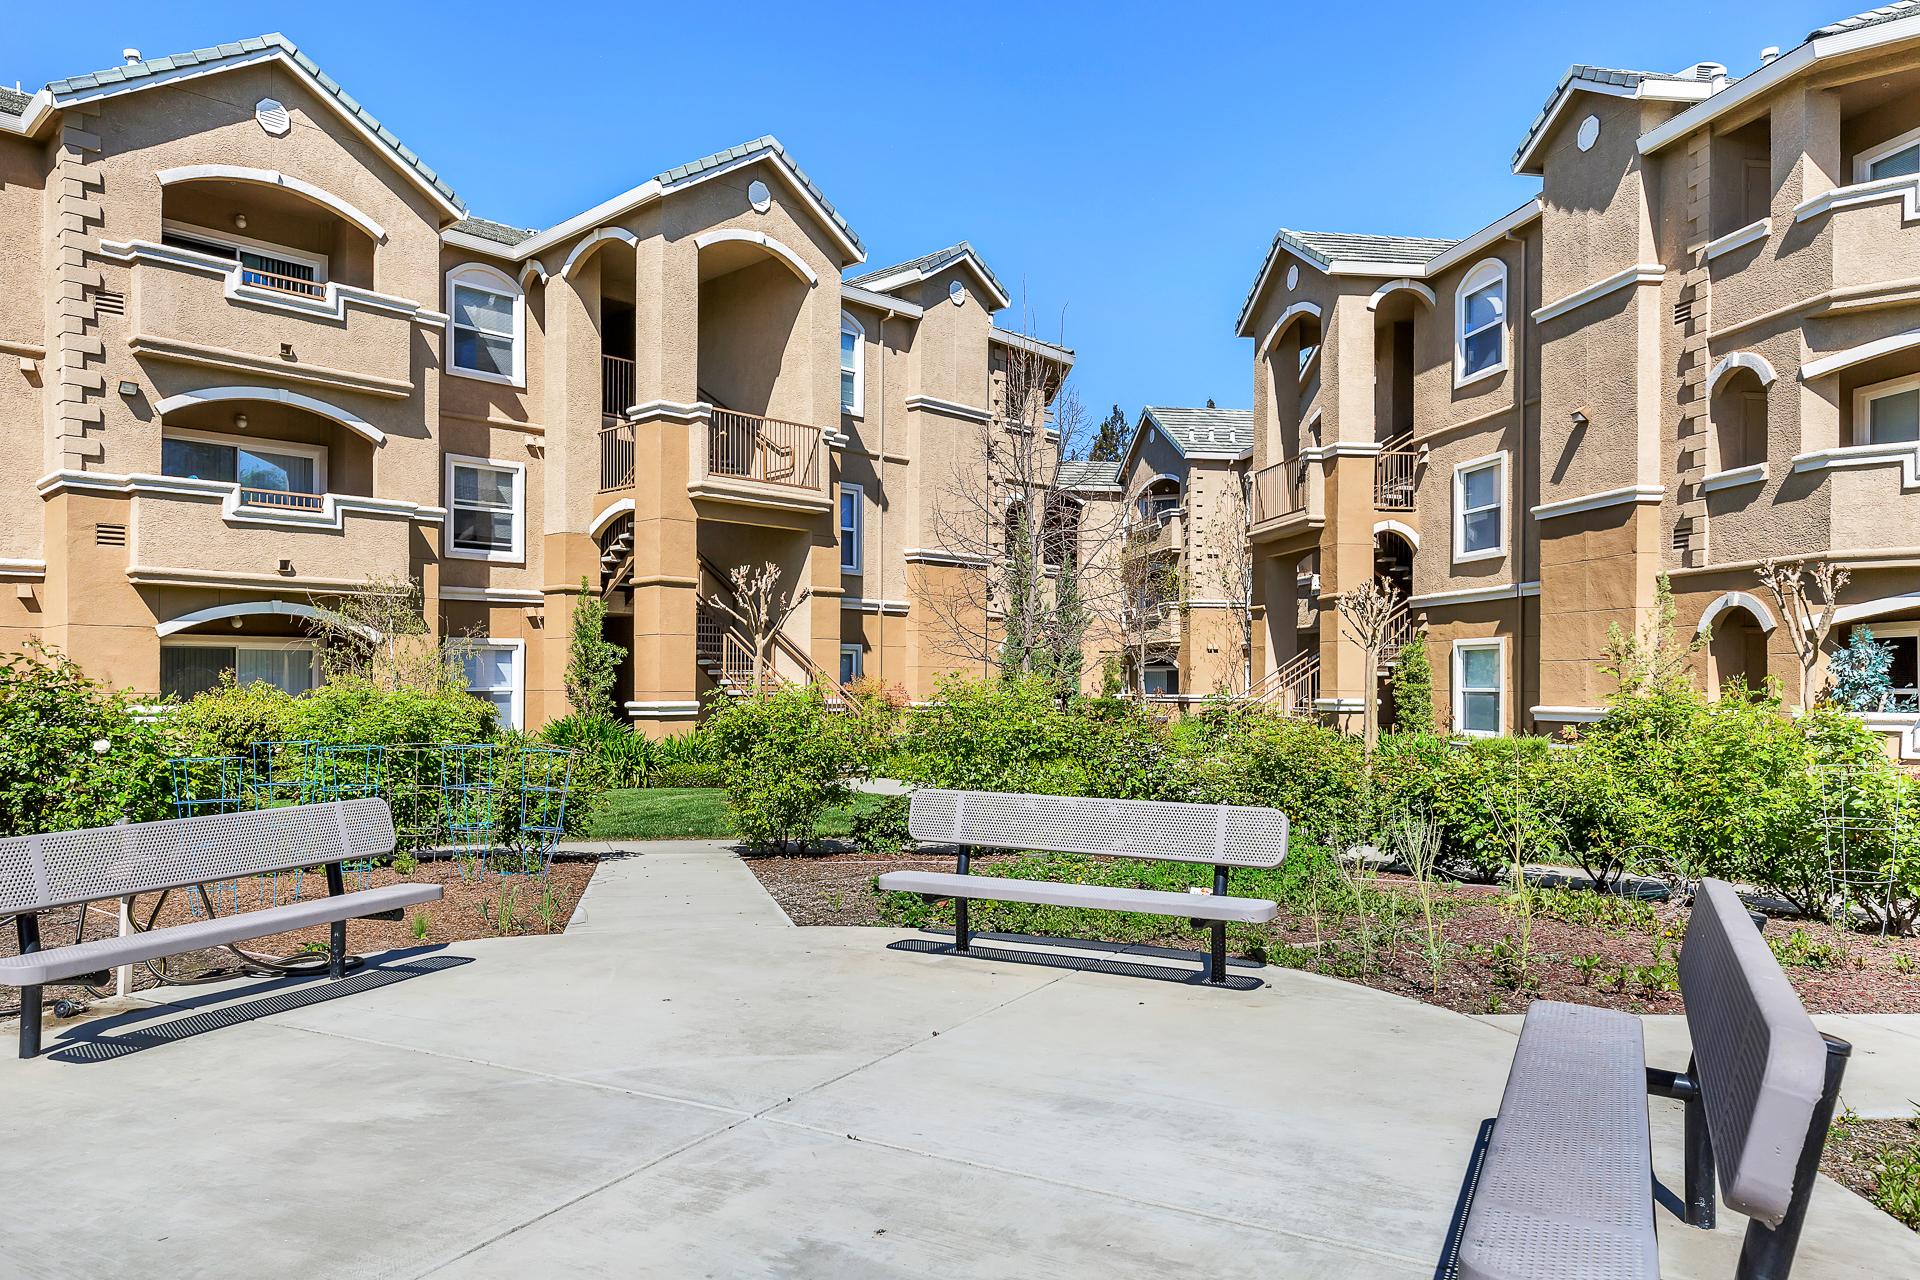 21-Sycamore-Terrace-Apartments-Photo-by-Brad-Ahlm-FairMarketPhoto-FullRes.jpg